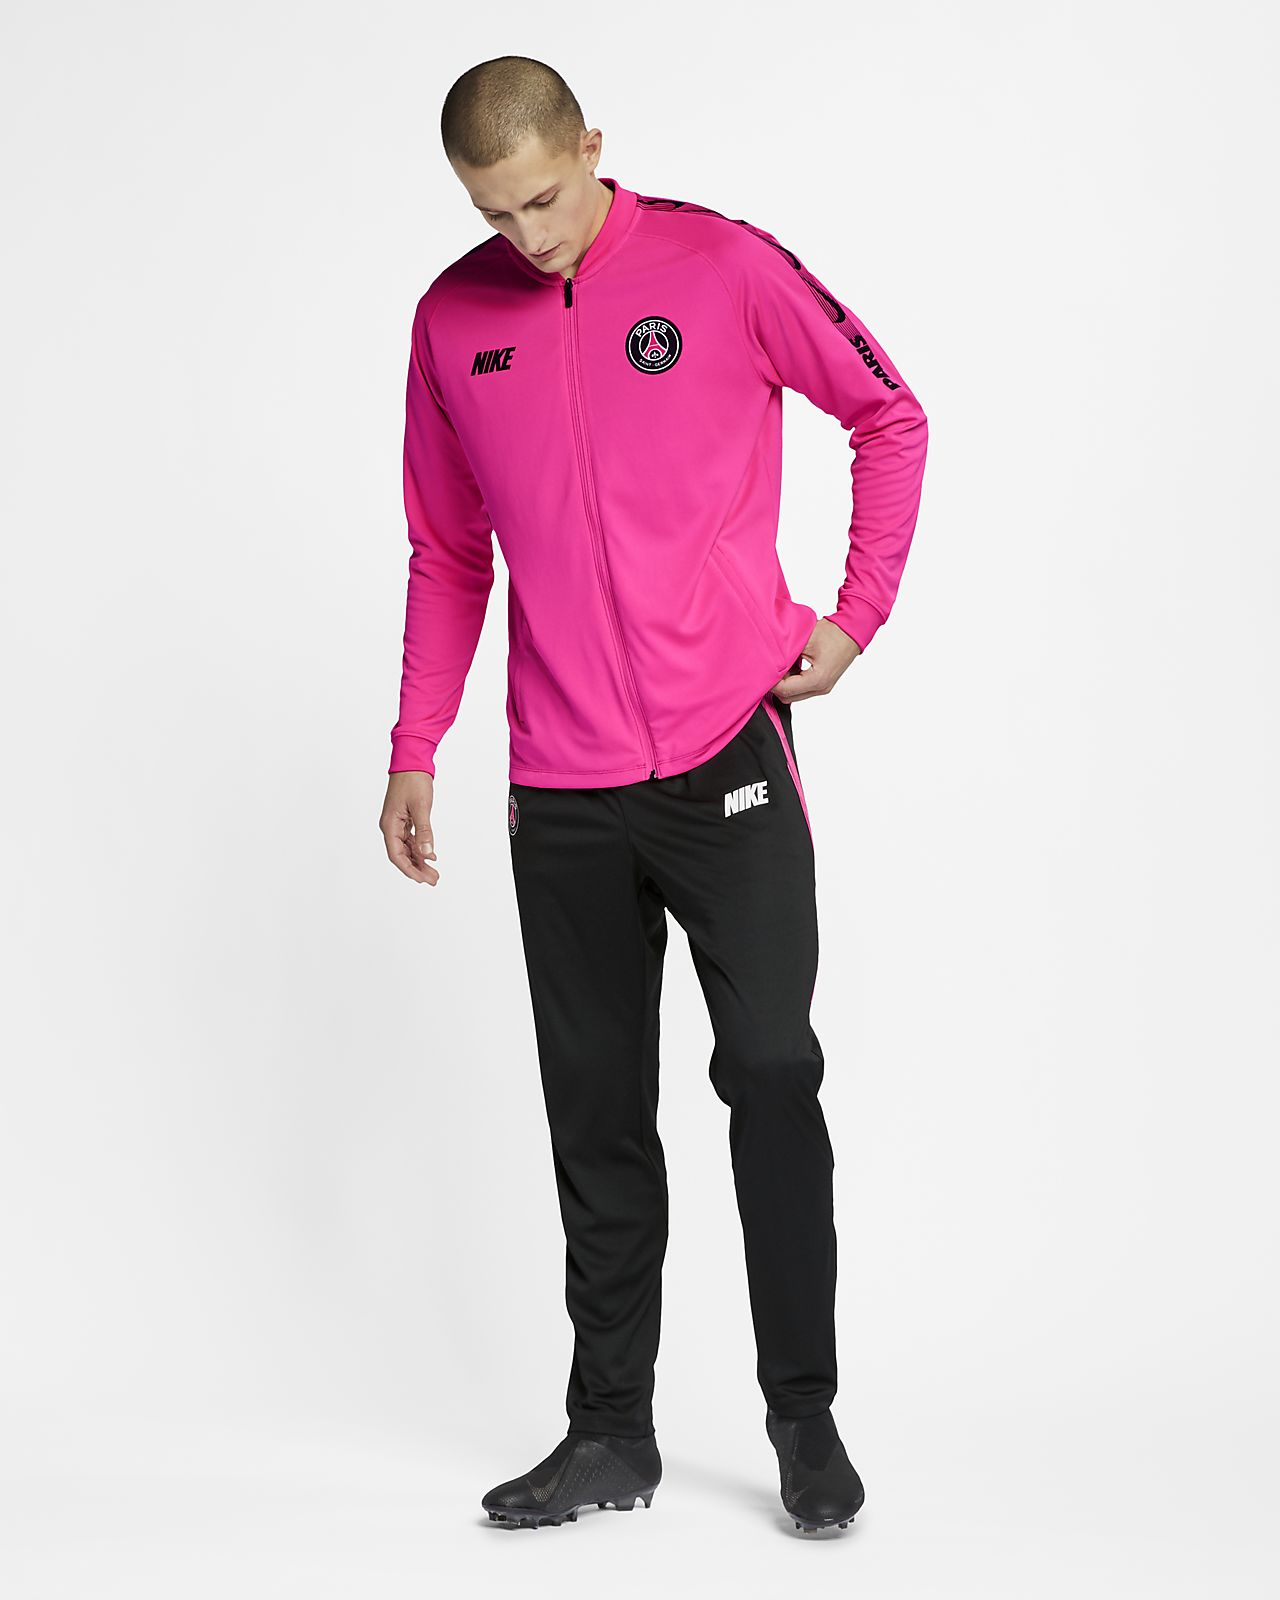 abe6c18a72e9f ... Conjunto de entrenamiento de fútbol para hombre Paris Saint-Germain  Dri-FIT Squad